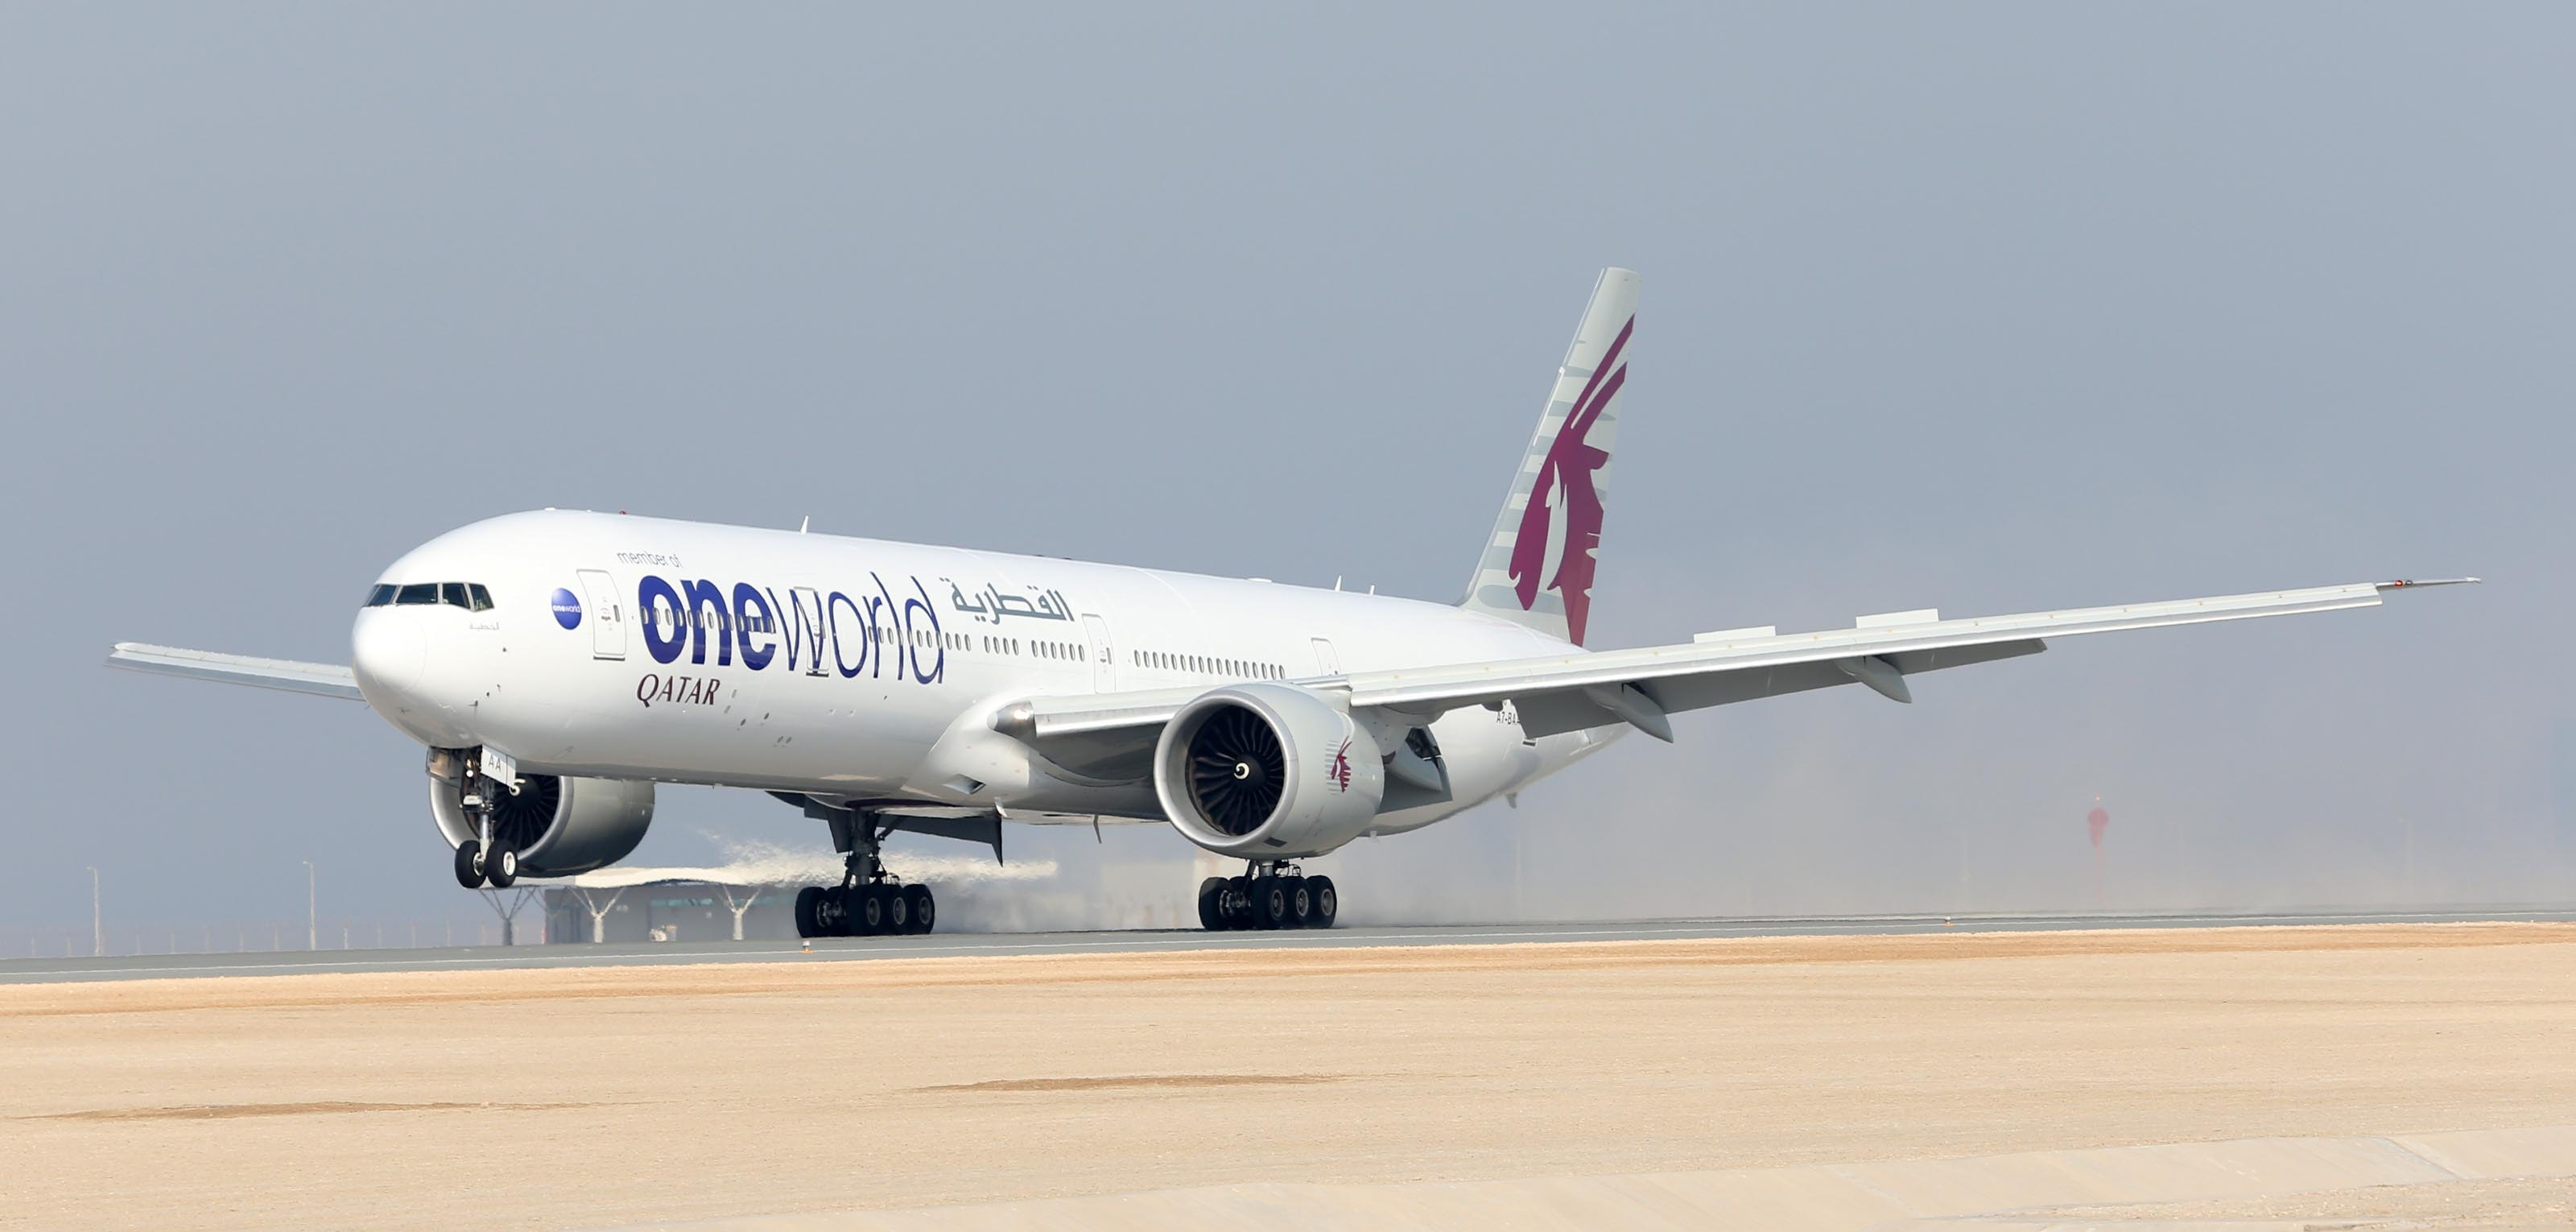 Qatar menyumbangkan 20 destinasi baru bagi aliansi tersebut.